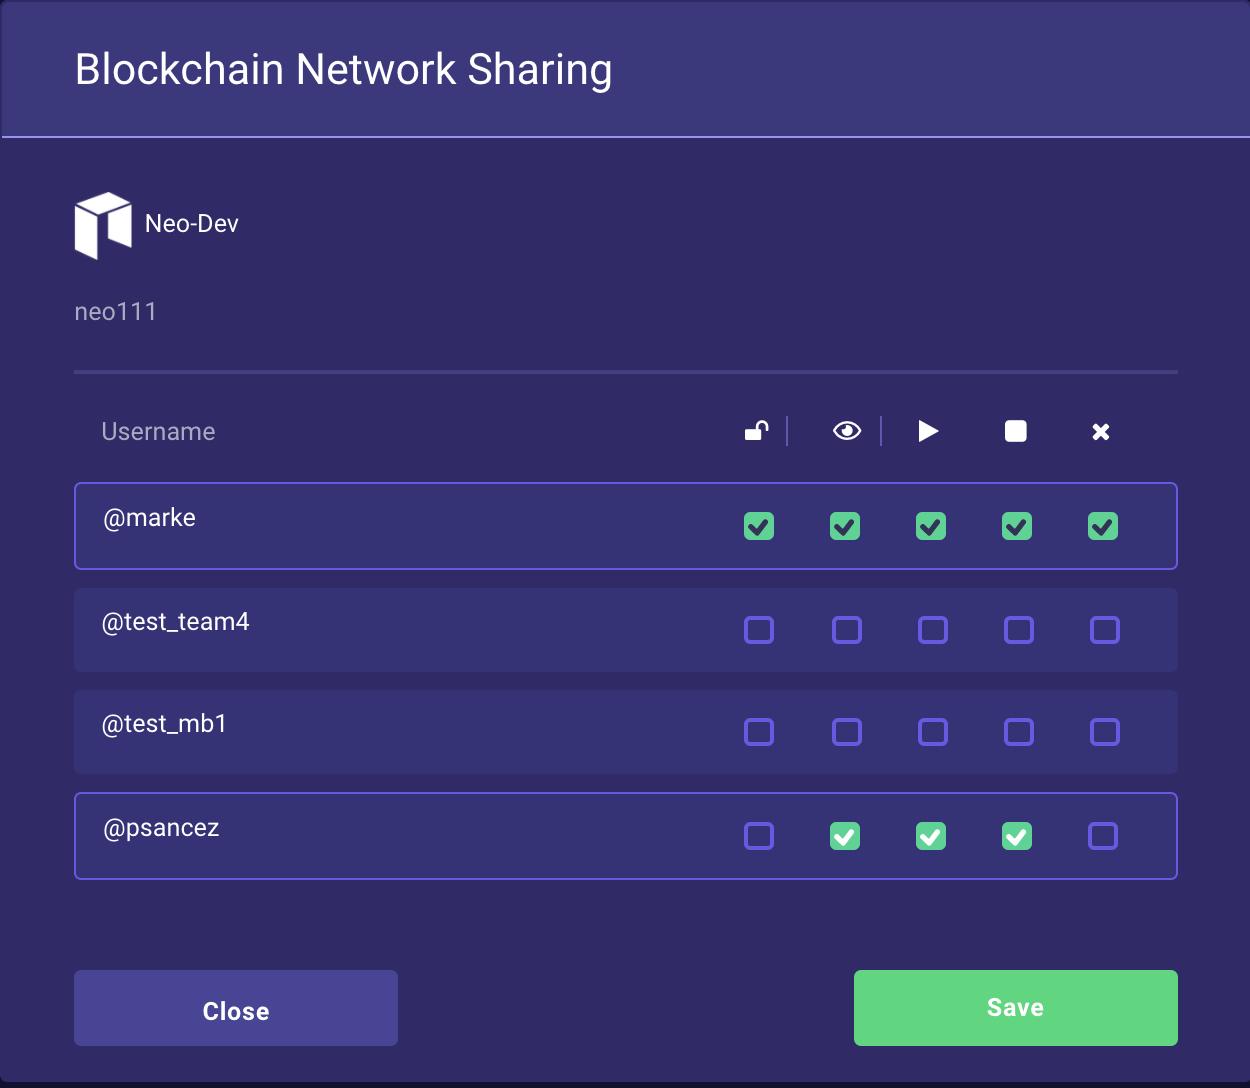 Share blockchain permission